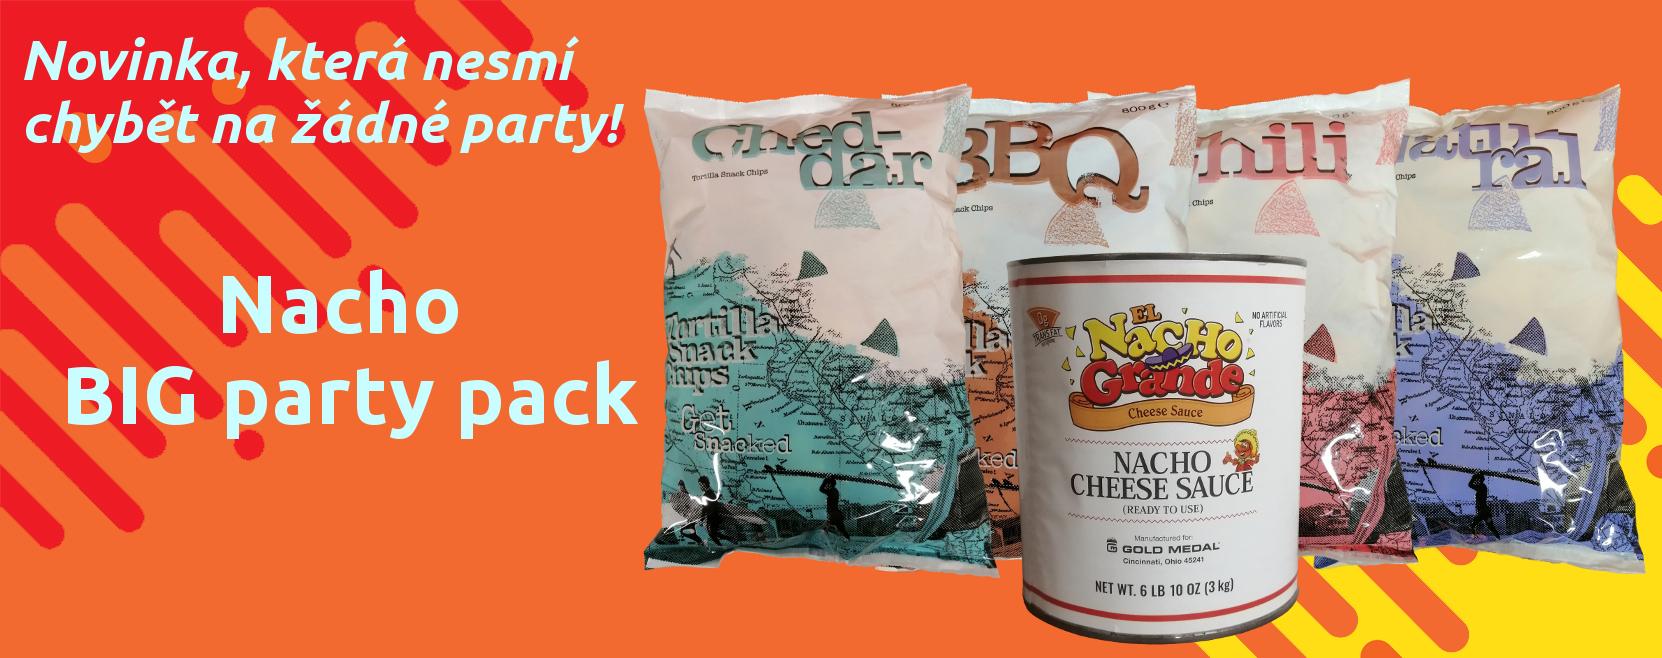 Nacho BIG party pack